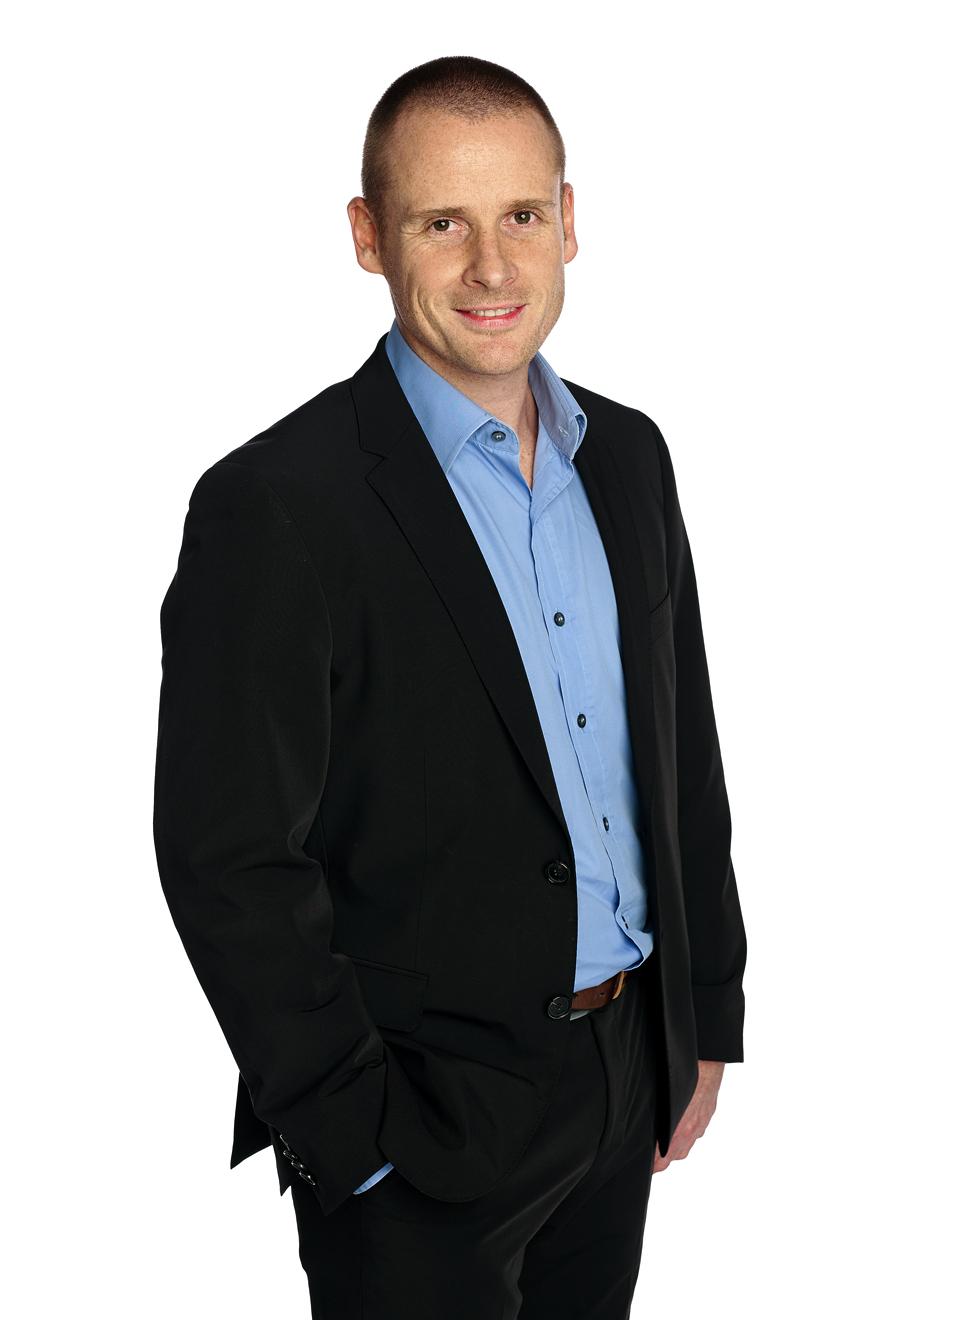 Jurgen Bosmans